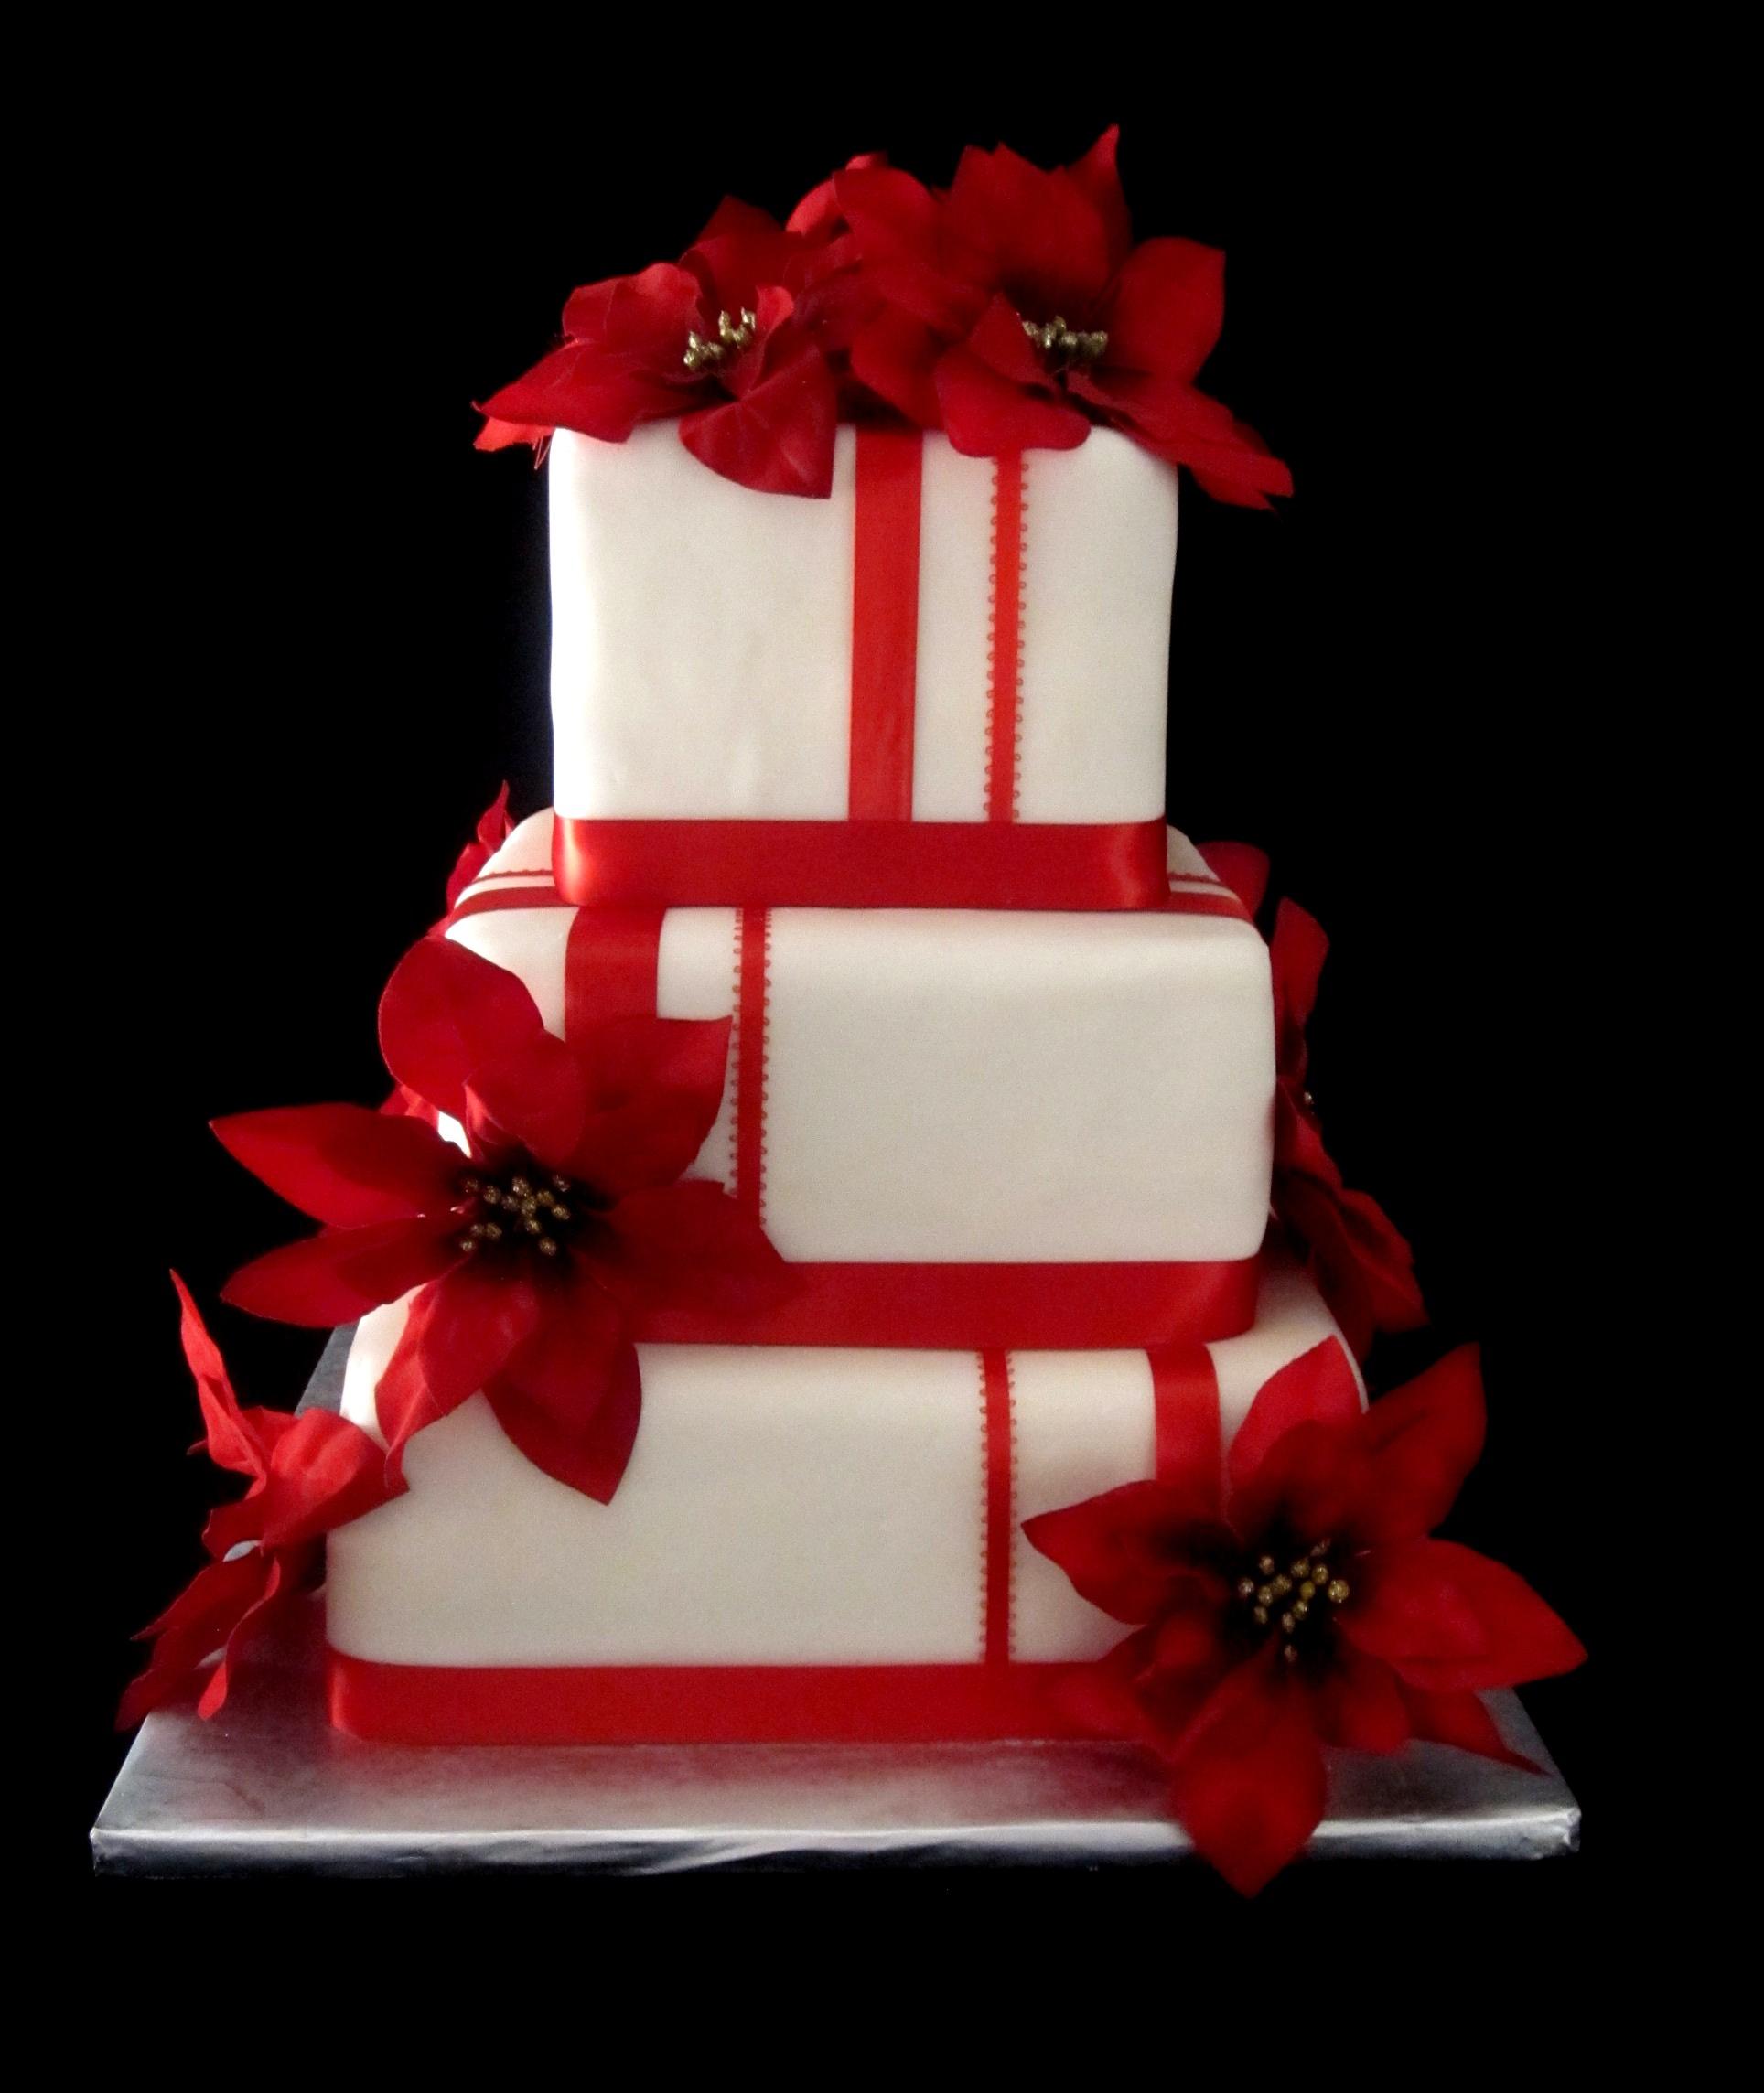 SHOPRITE CAKE PRICES